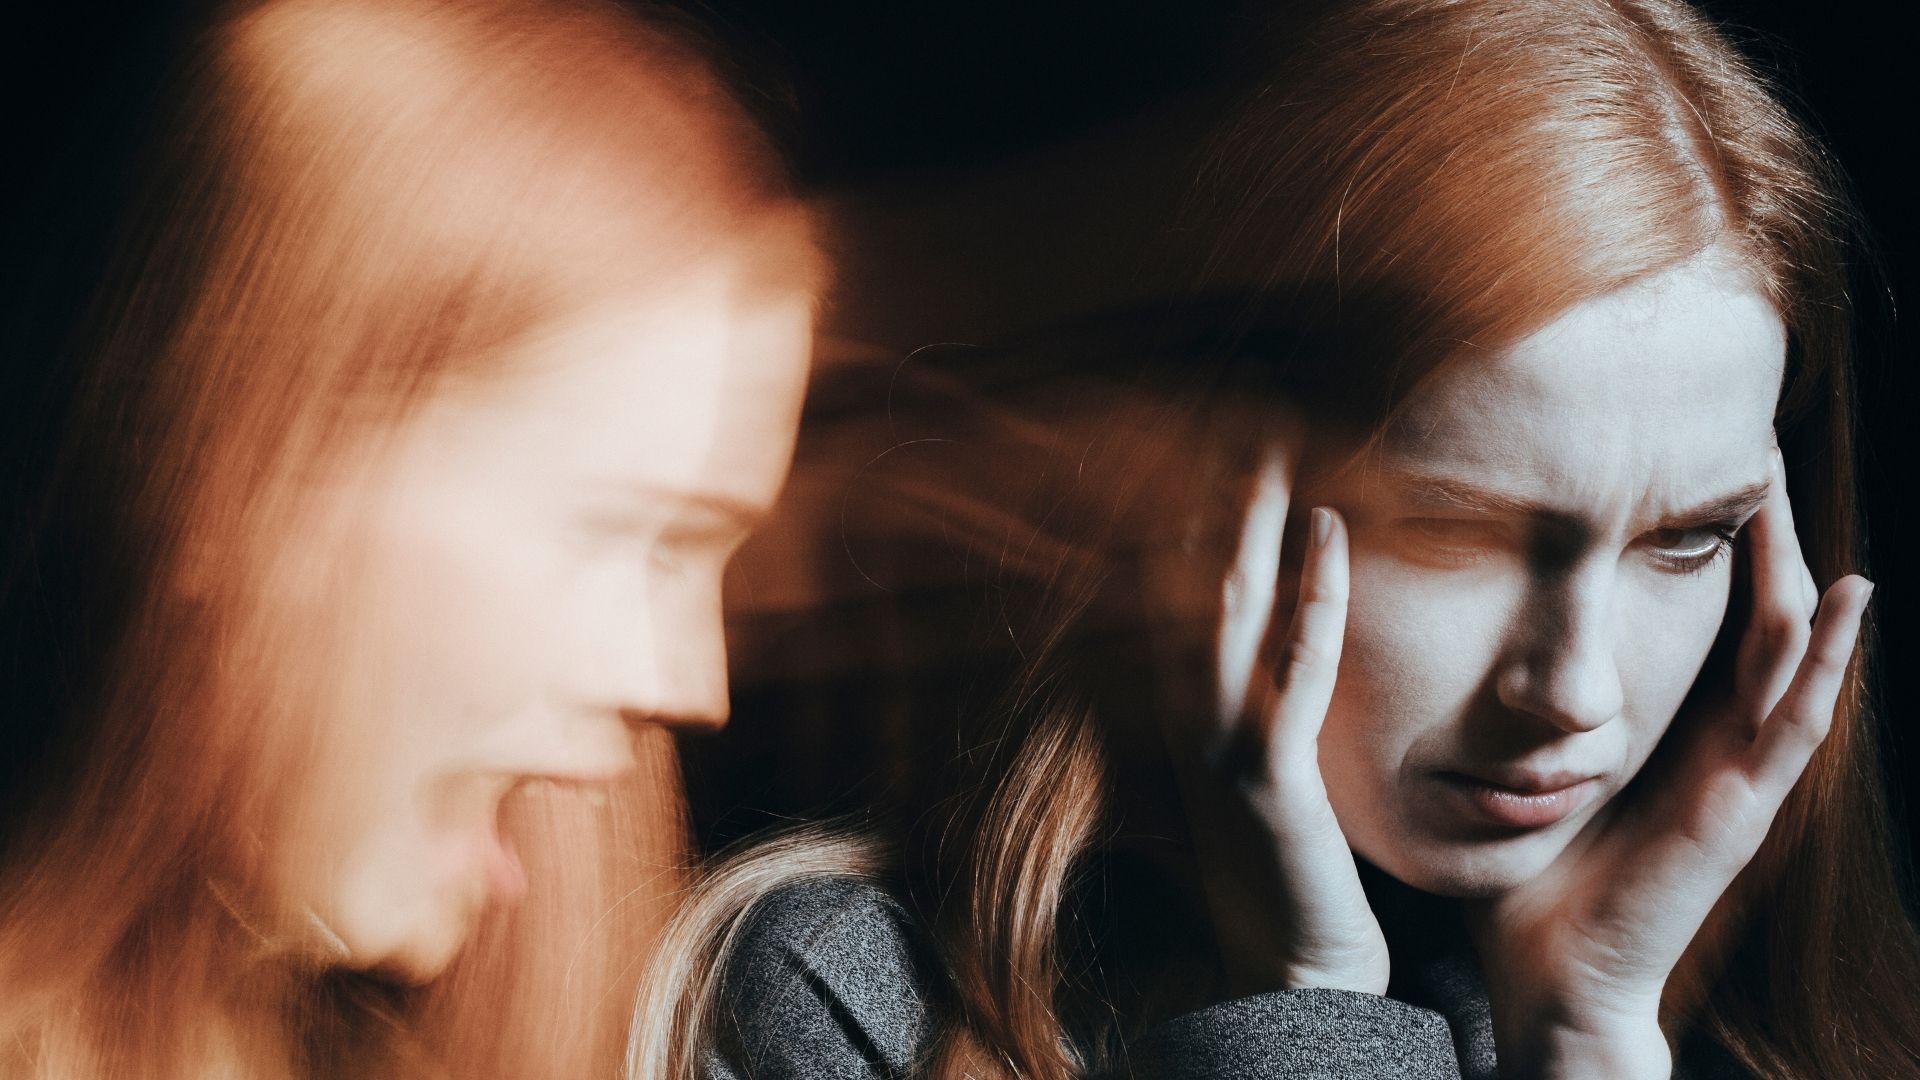 woman schizophrenia - The line between schizophrenia and psychic abilities